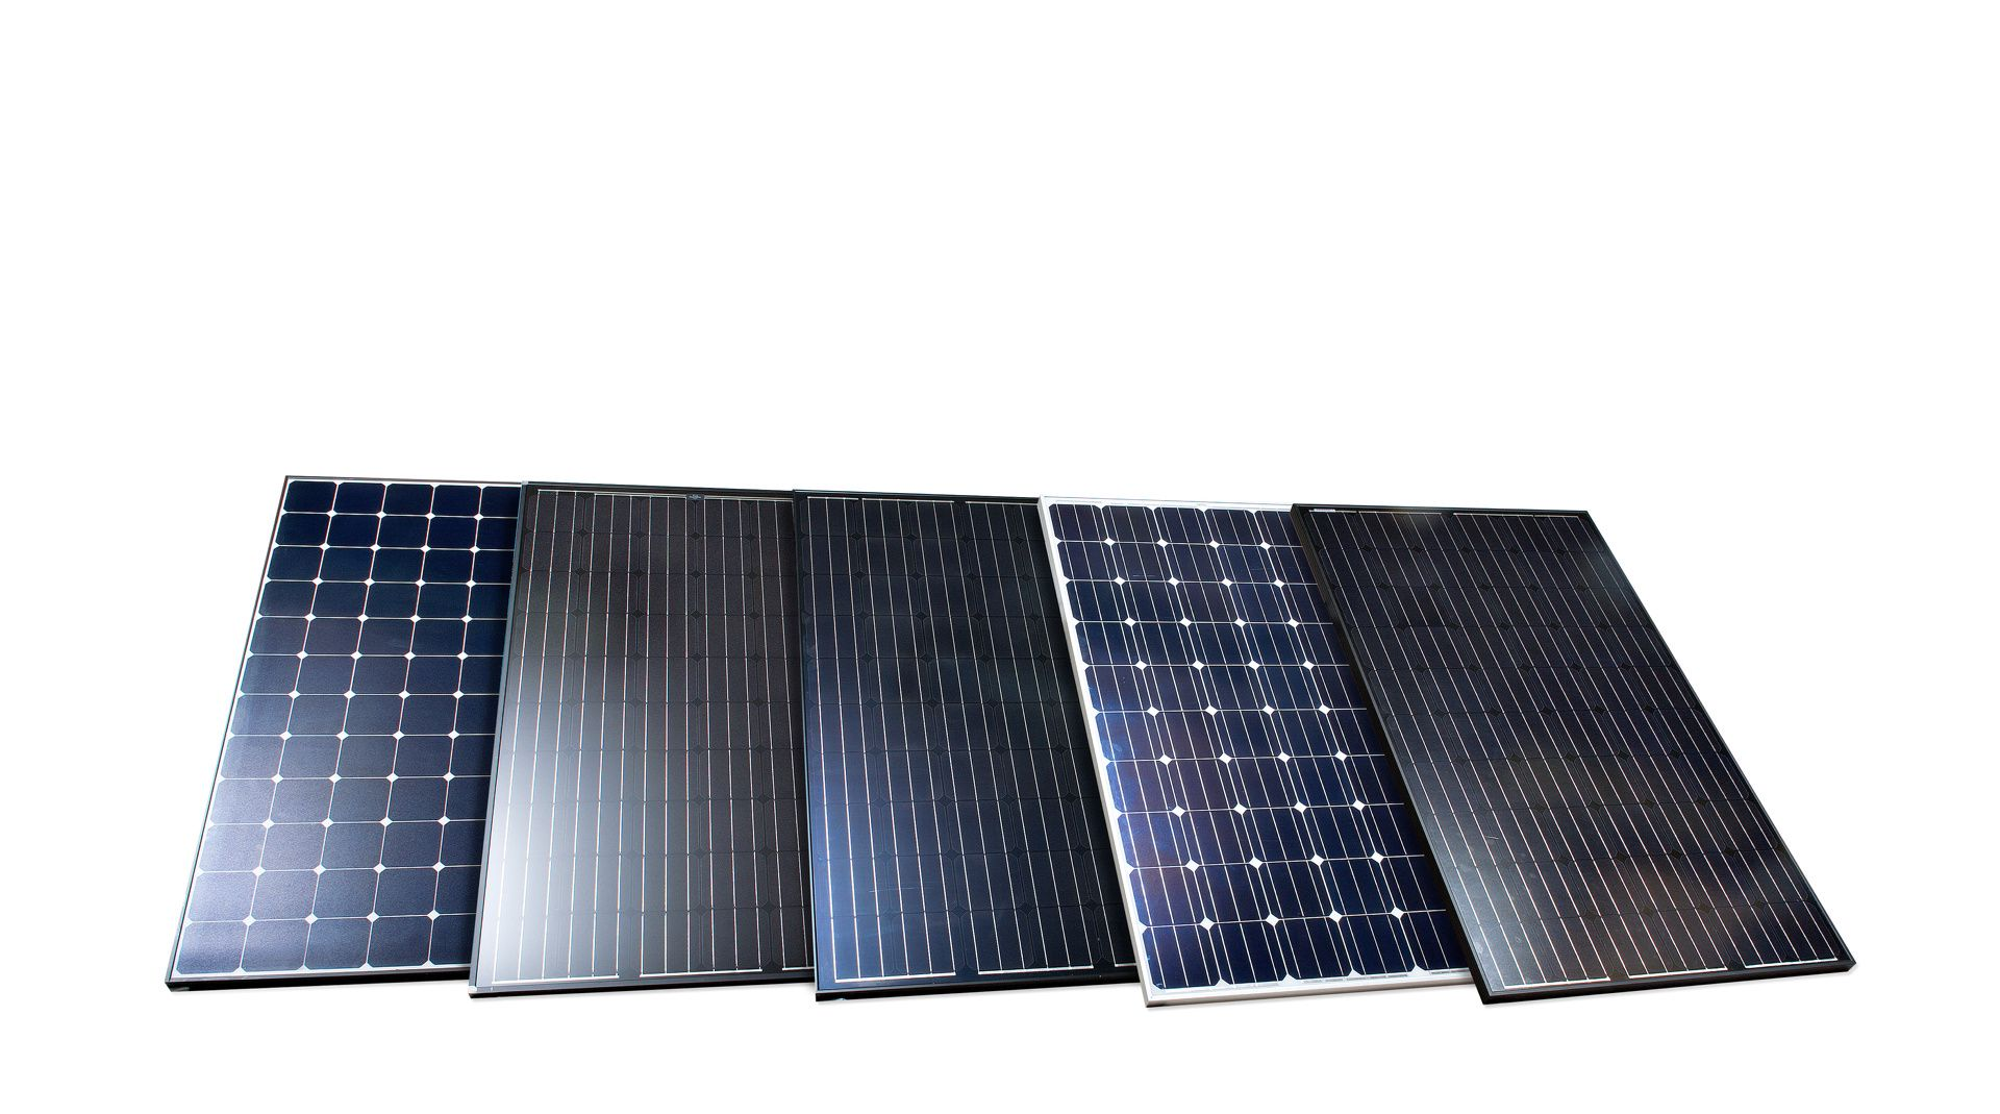 Solcellepanel test